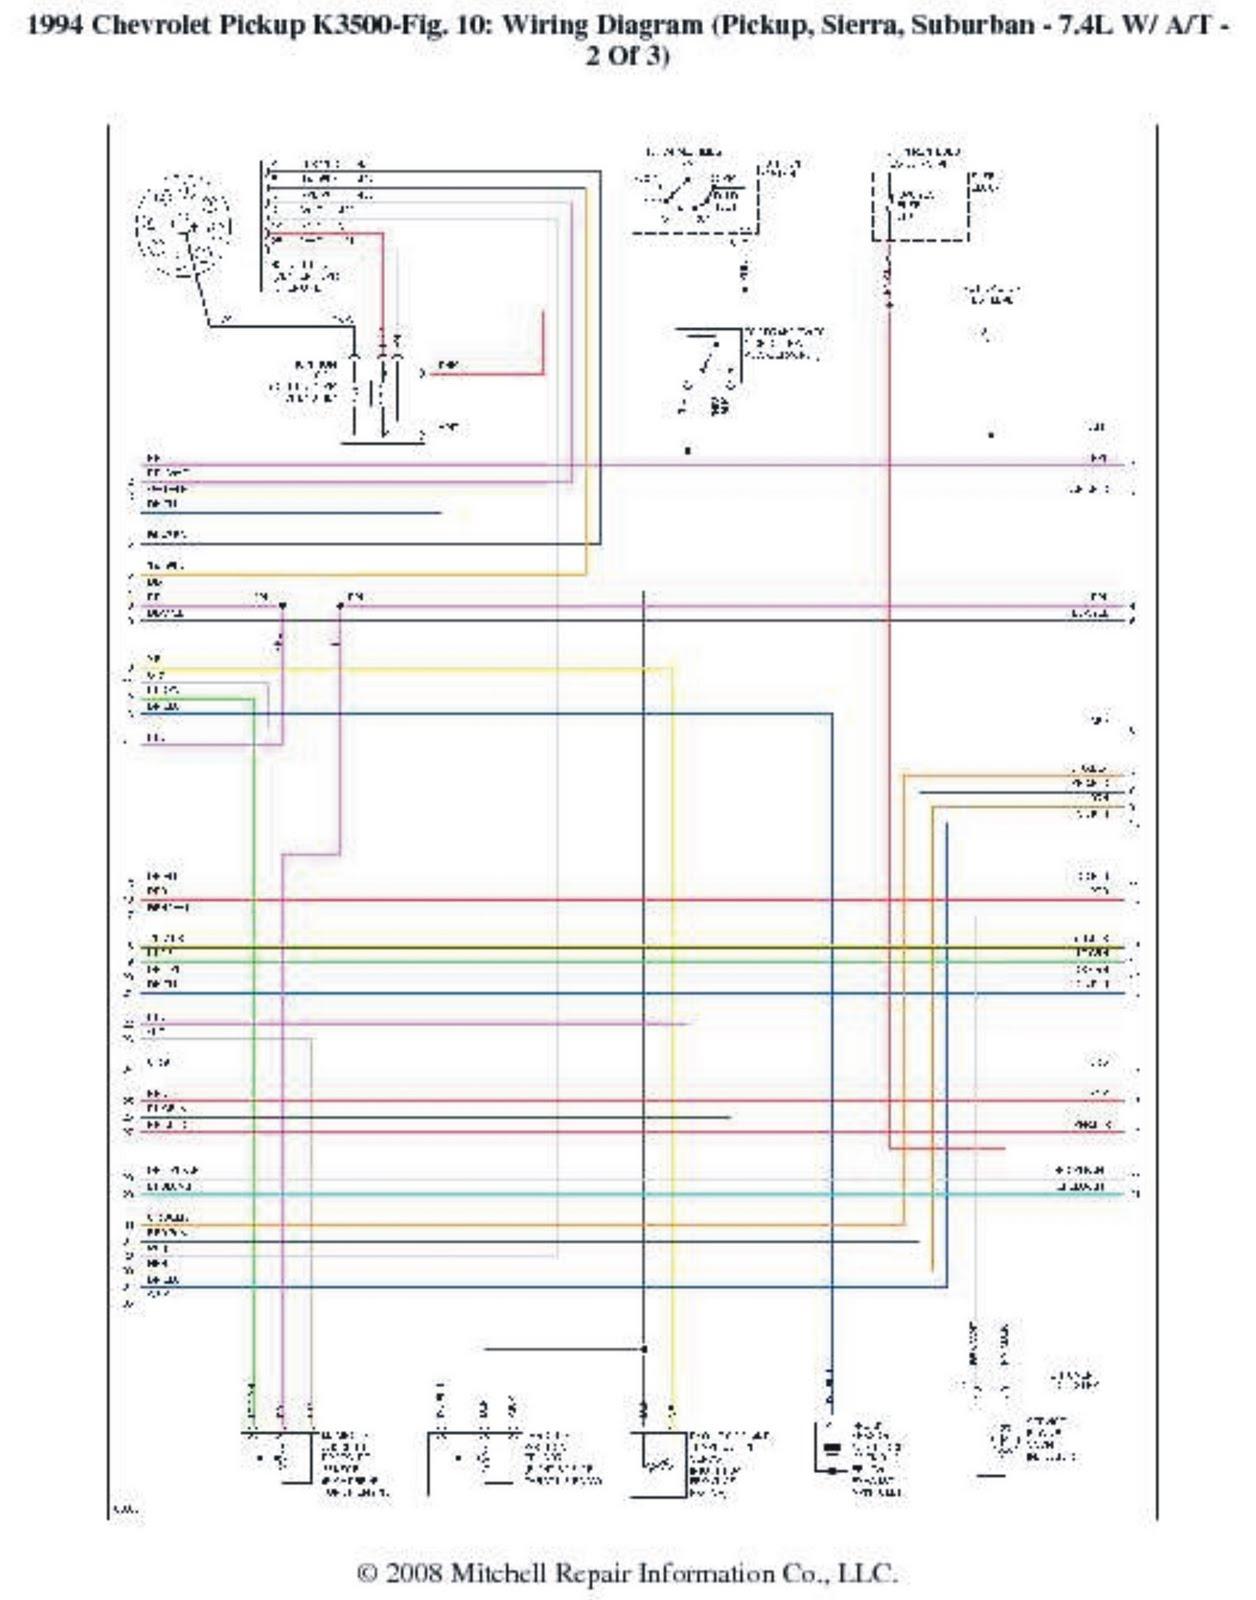 1994 Chevrolet PickUp K3500 Wiring Diagrams | Wiring